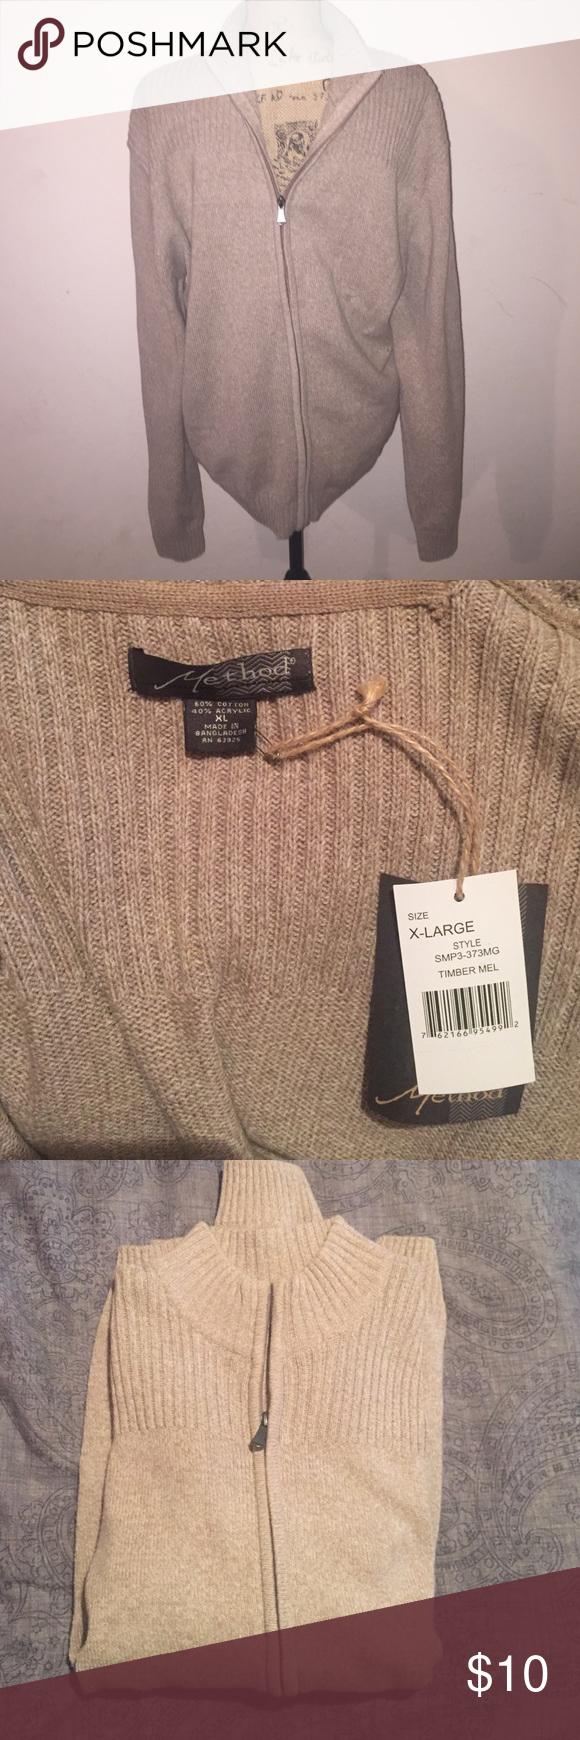 NWT beige/ cream color zip up XL Mens cardigan. NWT XL Mens zip up cardigan sweater. Sweaters Cardigan